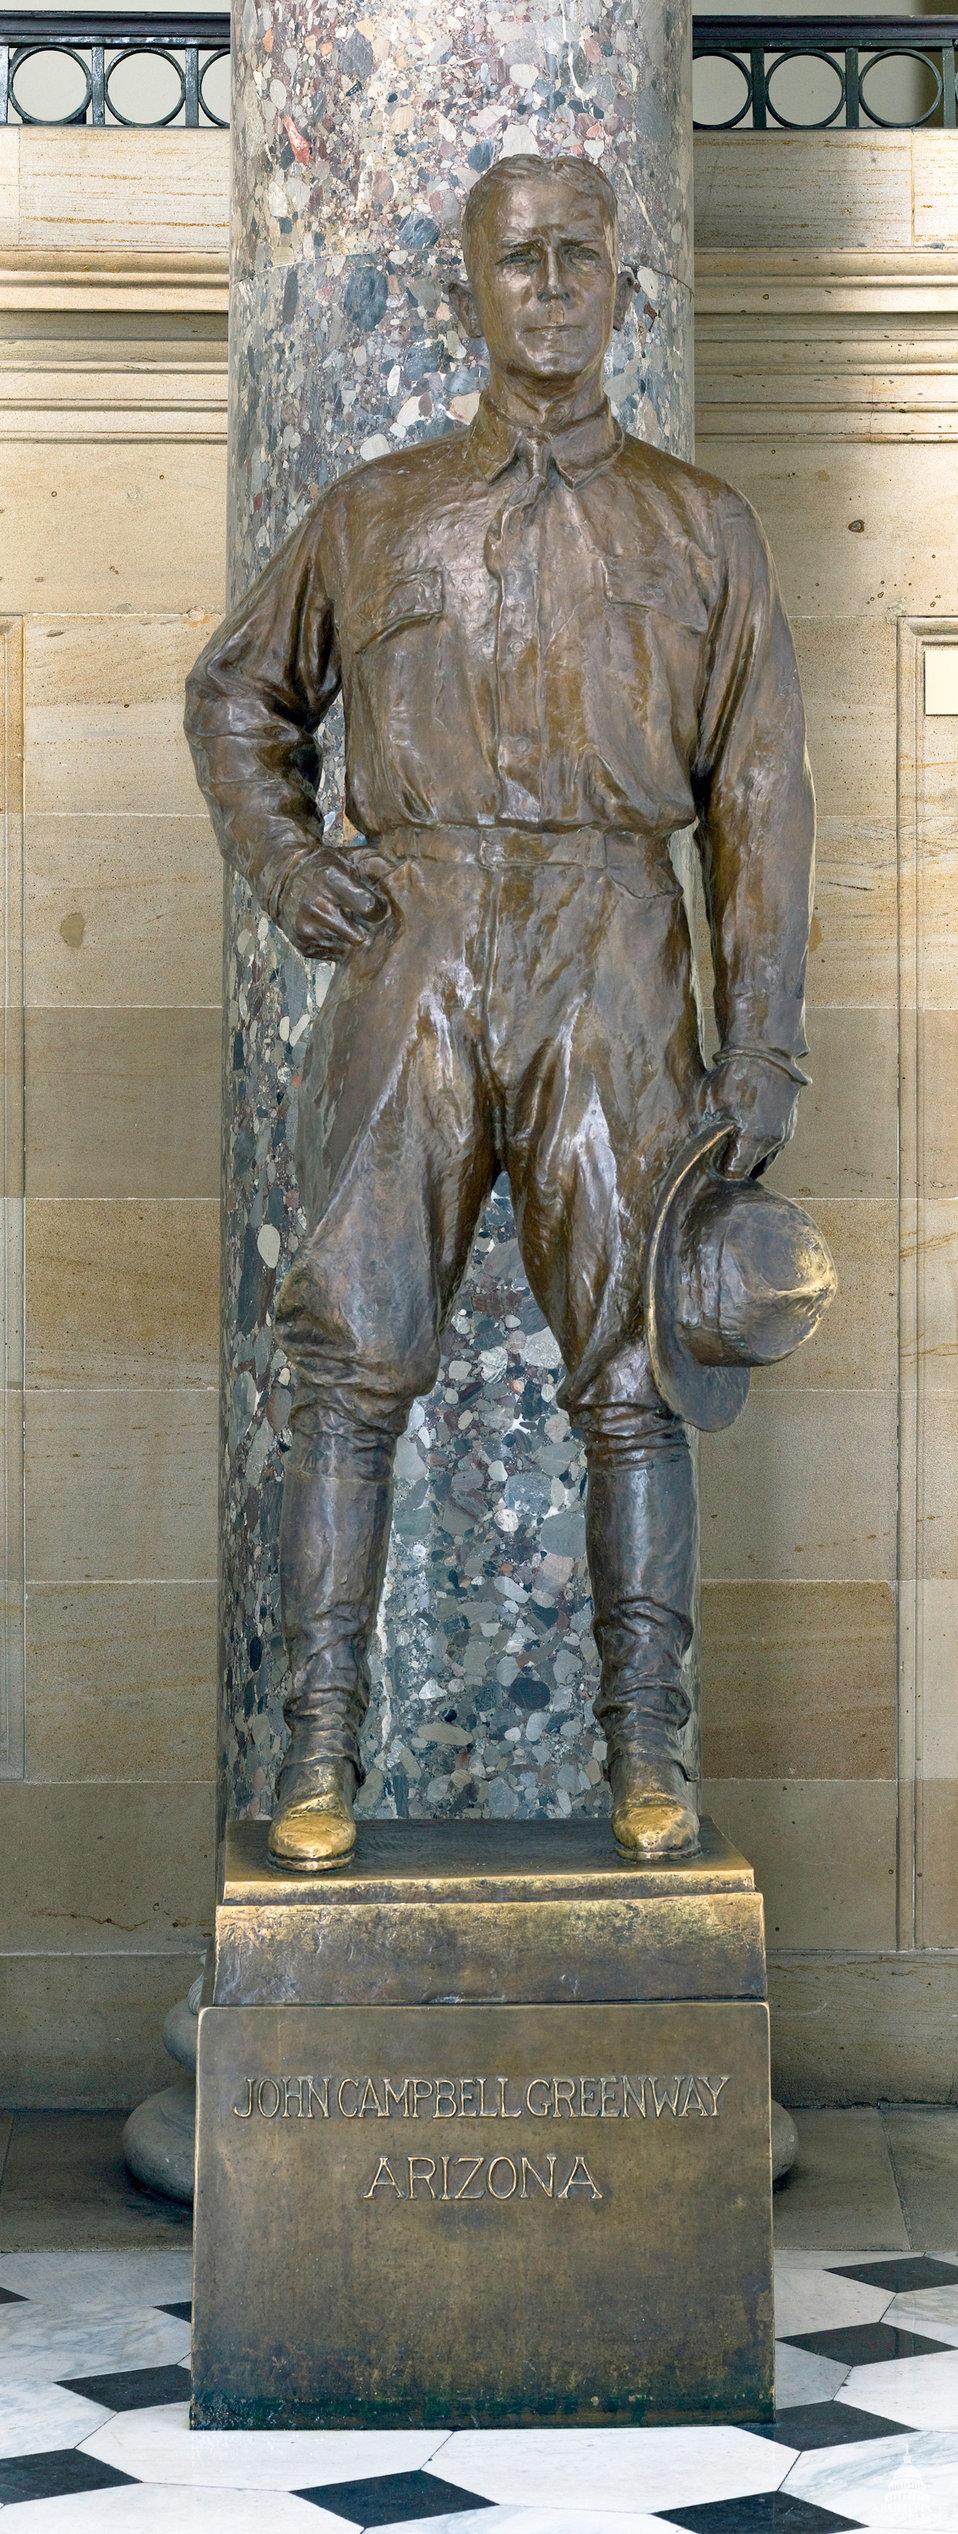 John Campbell Greenway Statue